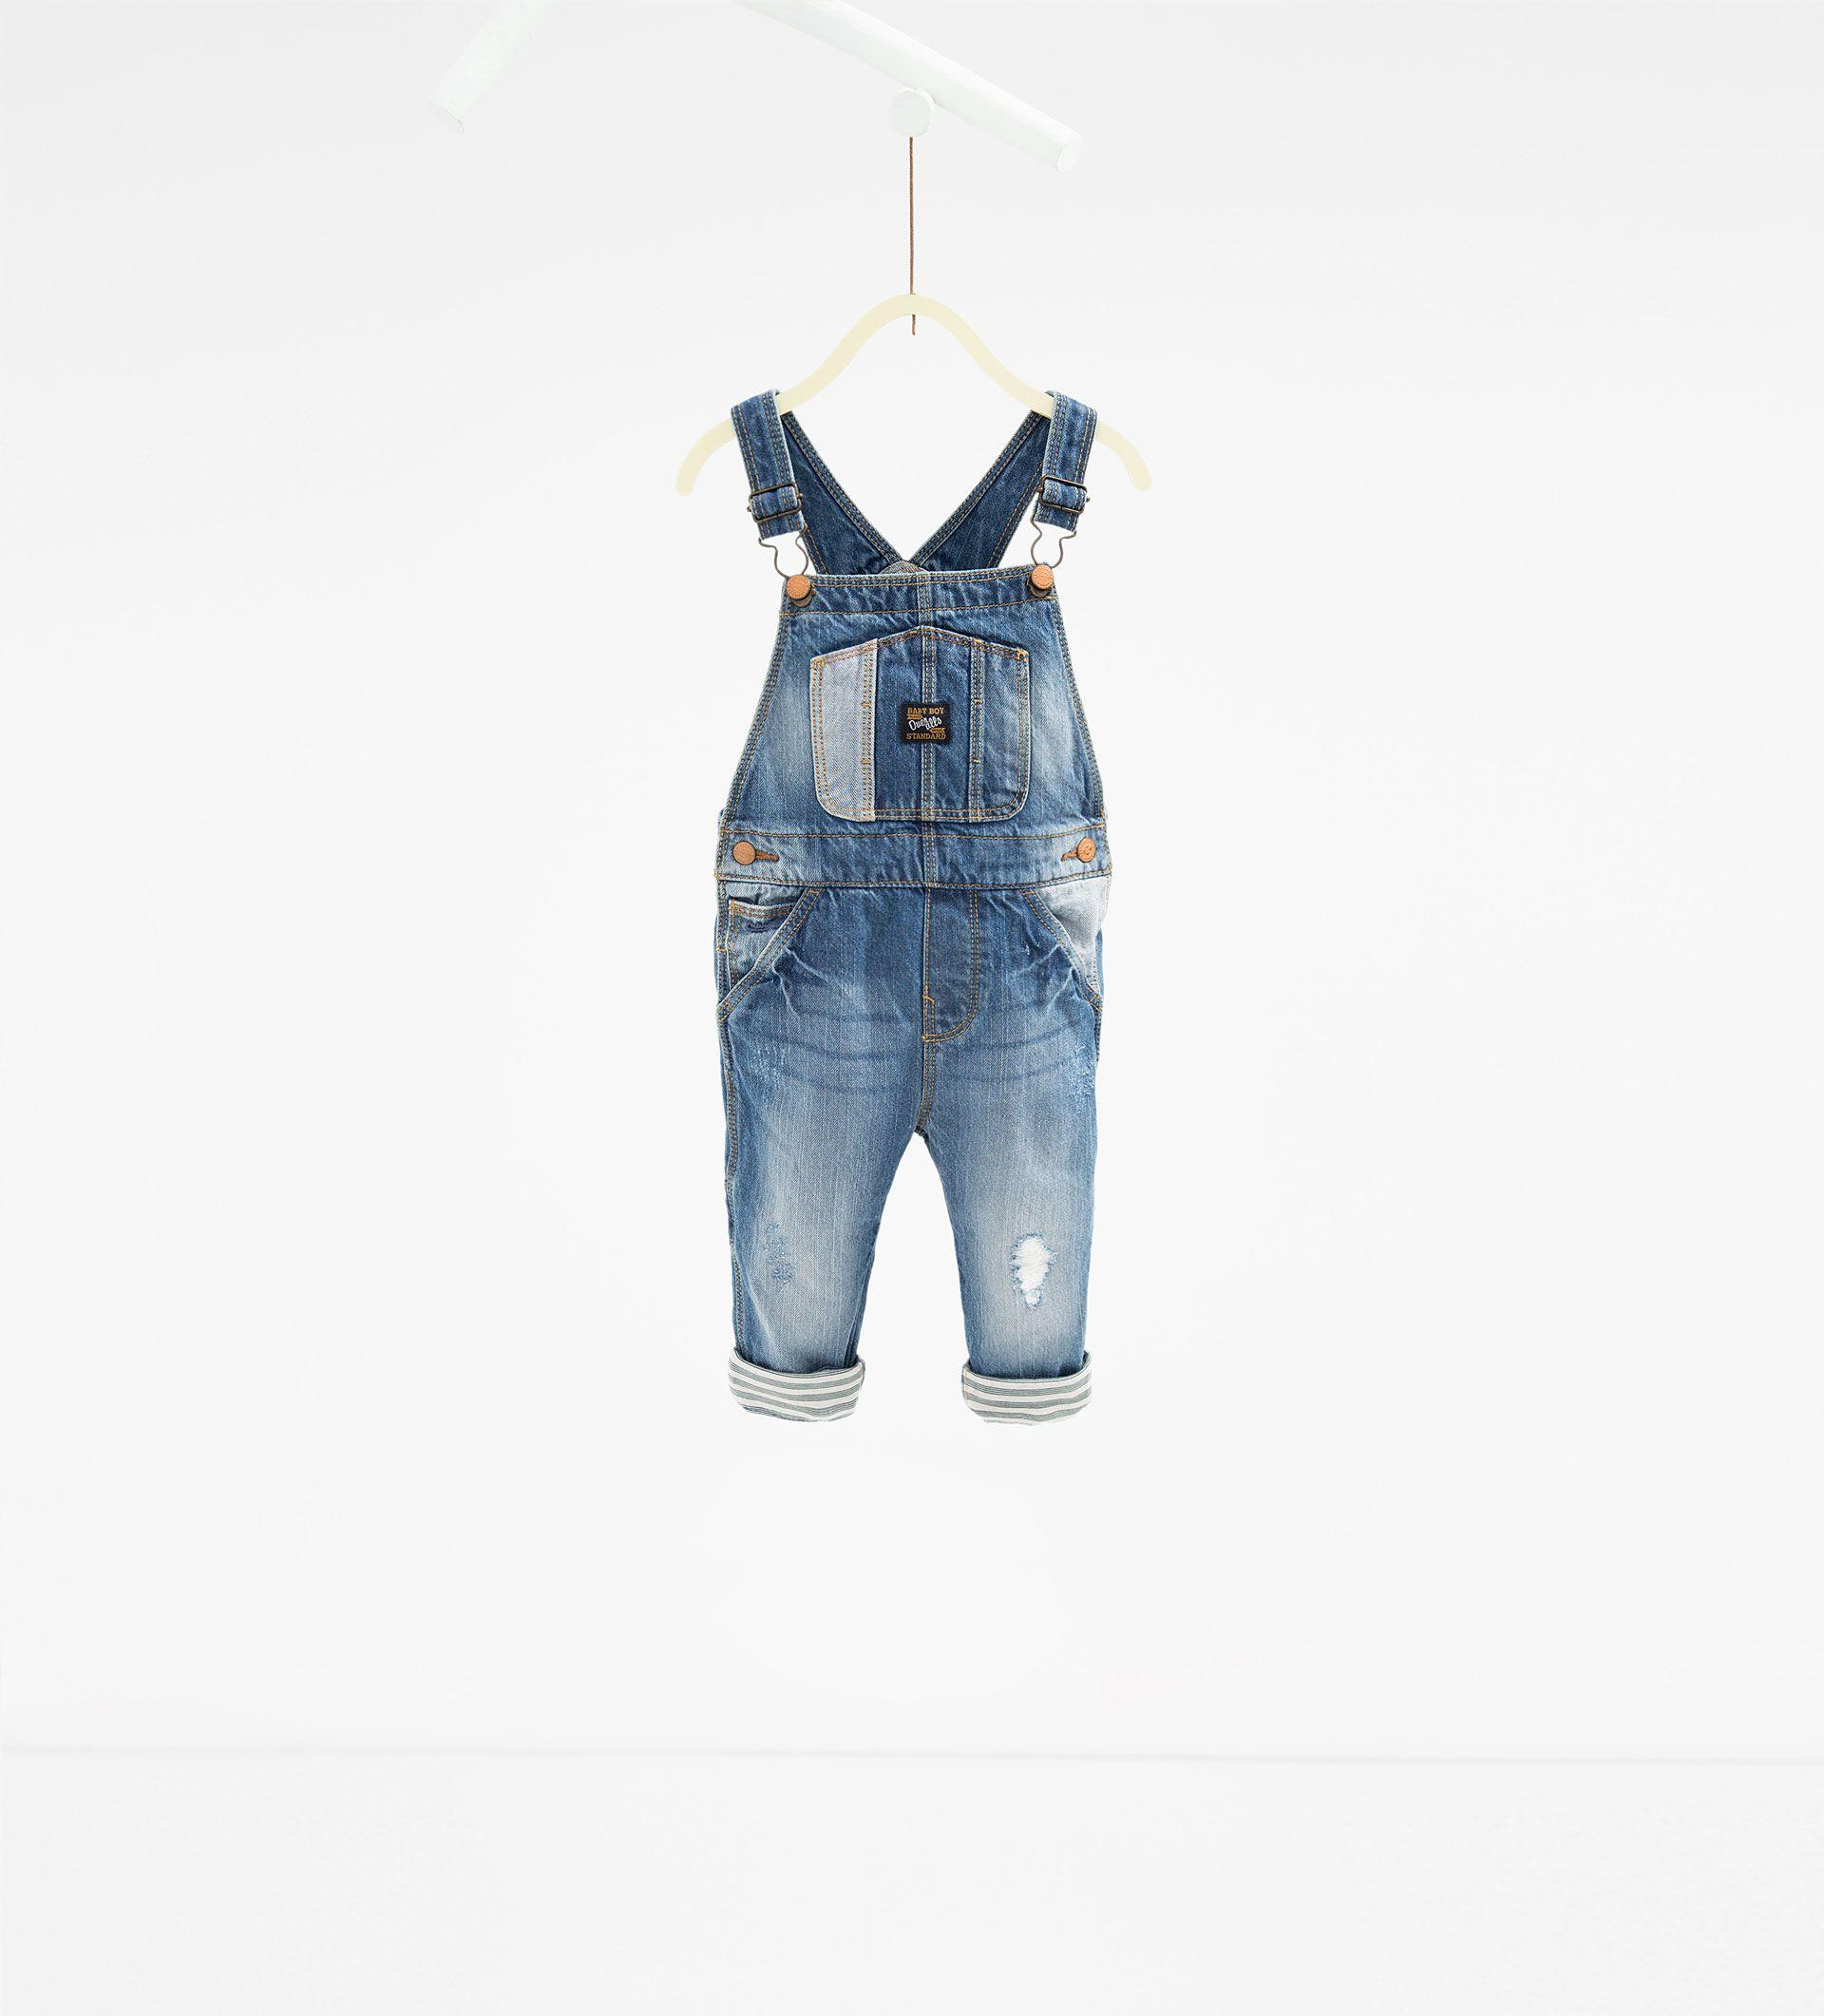 Jardineiras de ganga | Kids fashion | Pinterest | Ropa para niñas ...